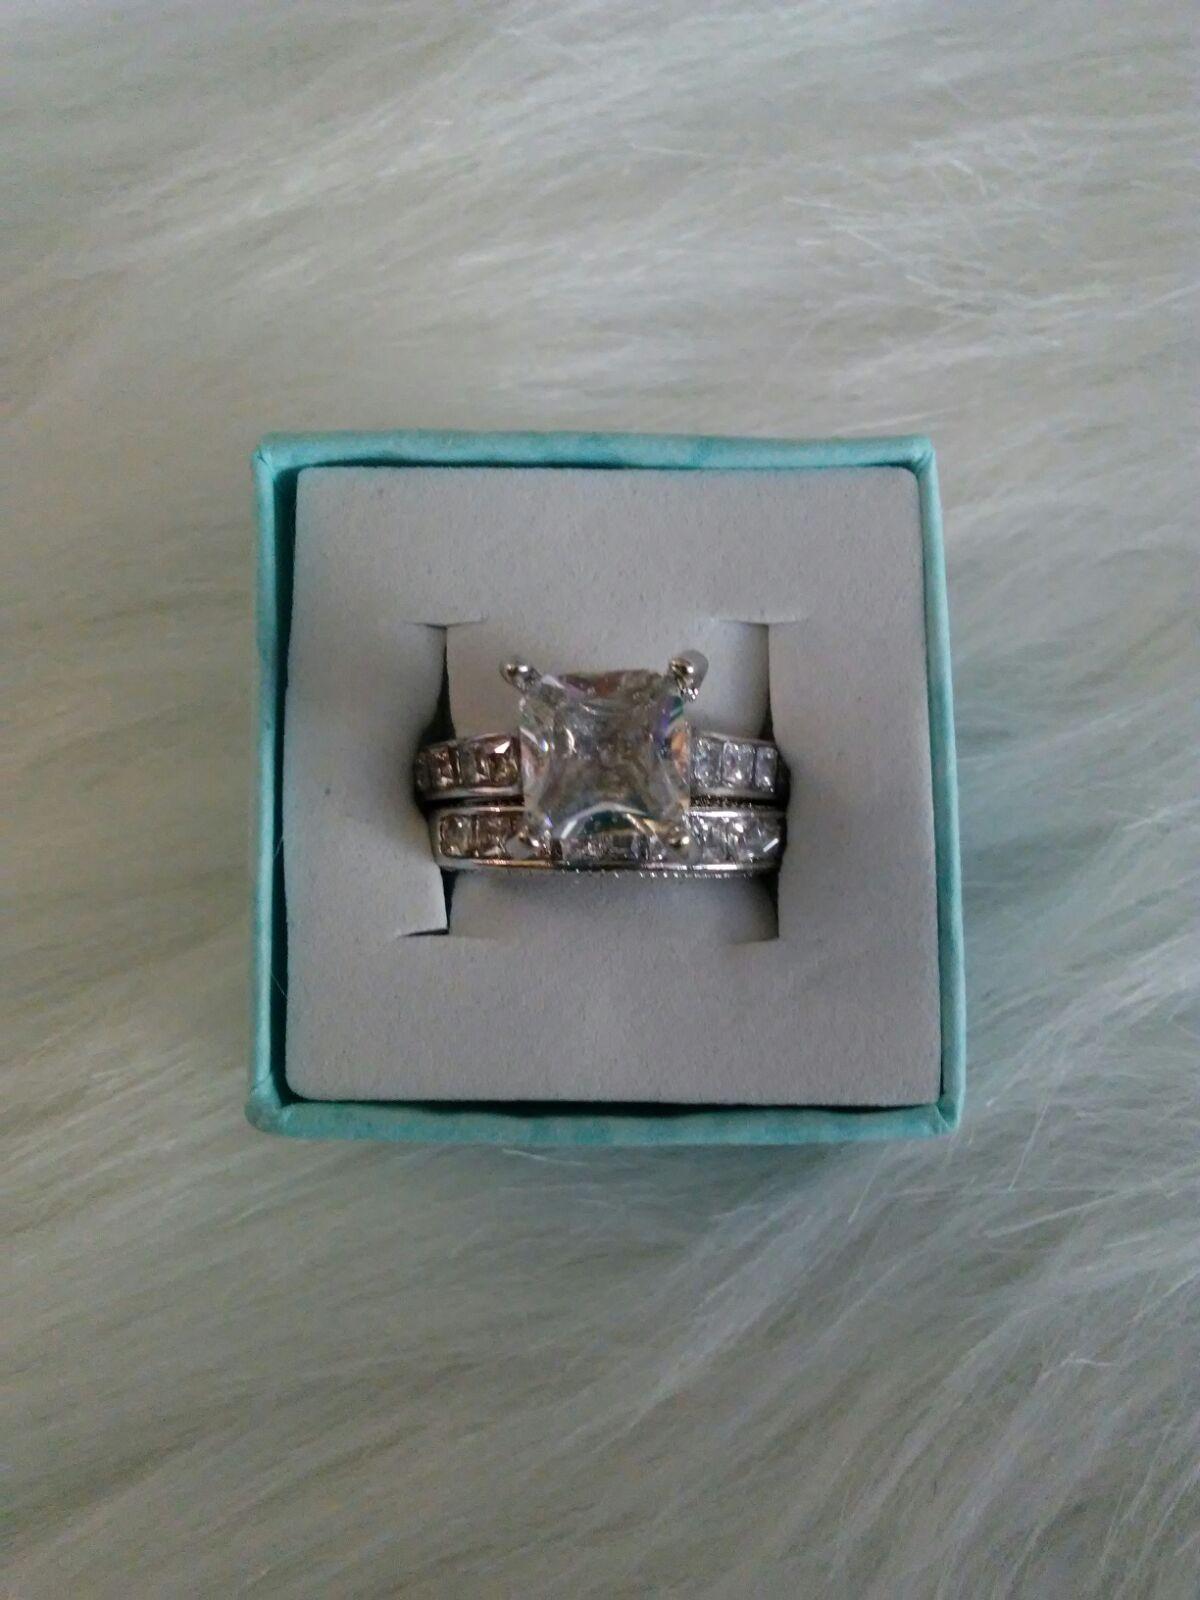 New Cubic Zirconia Bridal Set Mercari BUY & SELL THINGS YOU LOVE